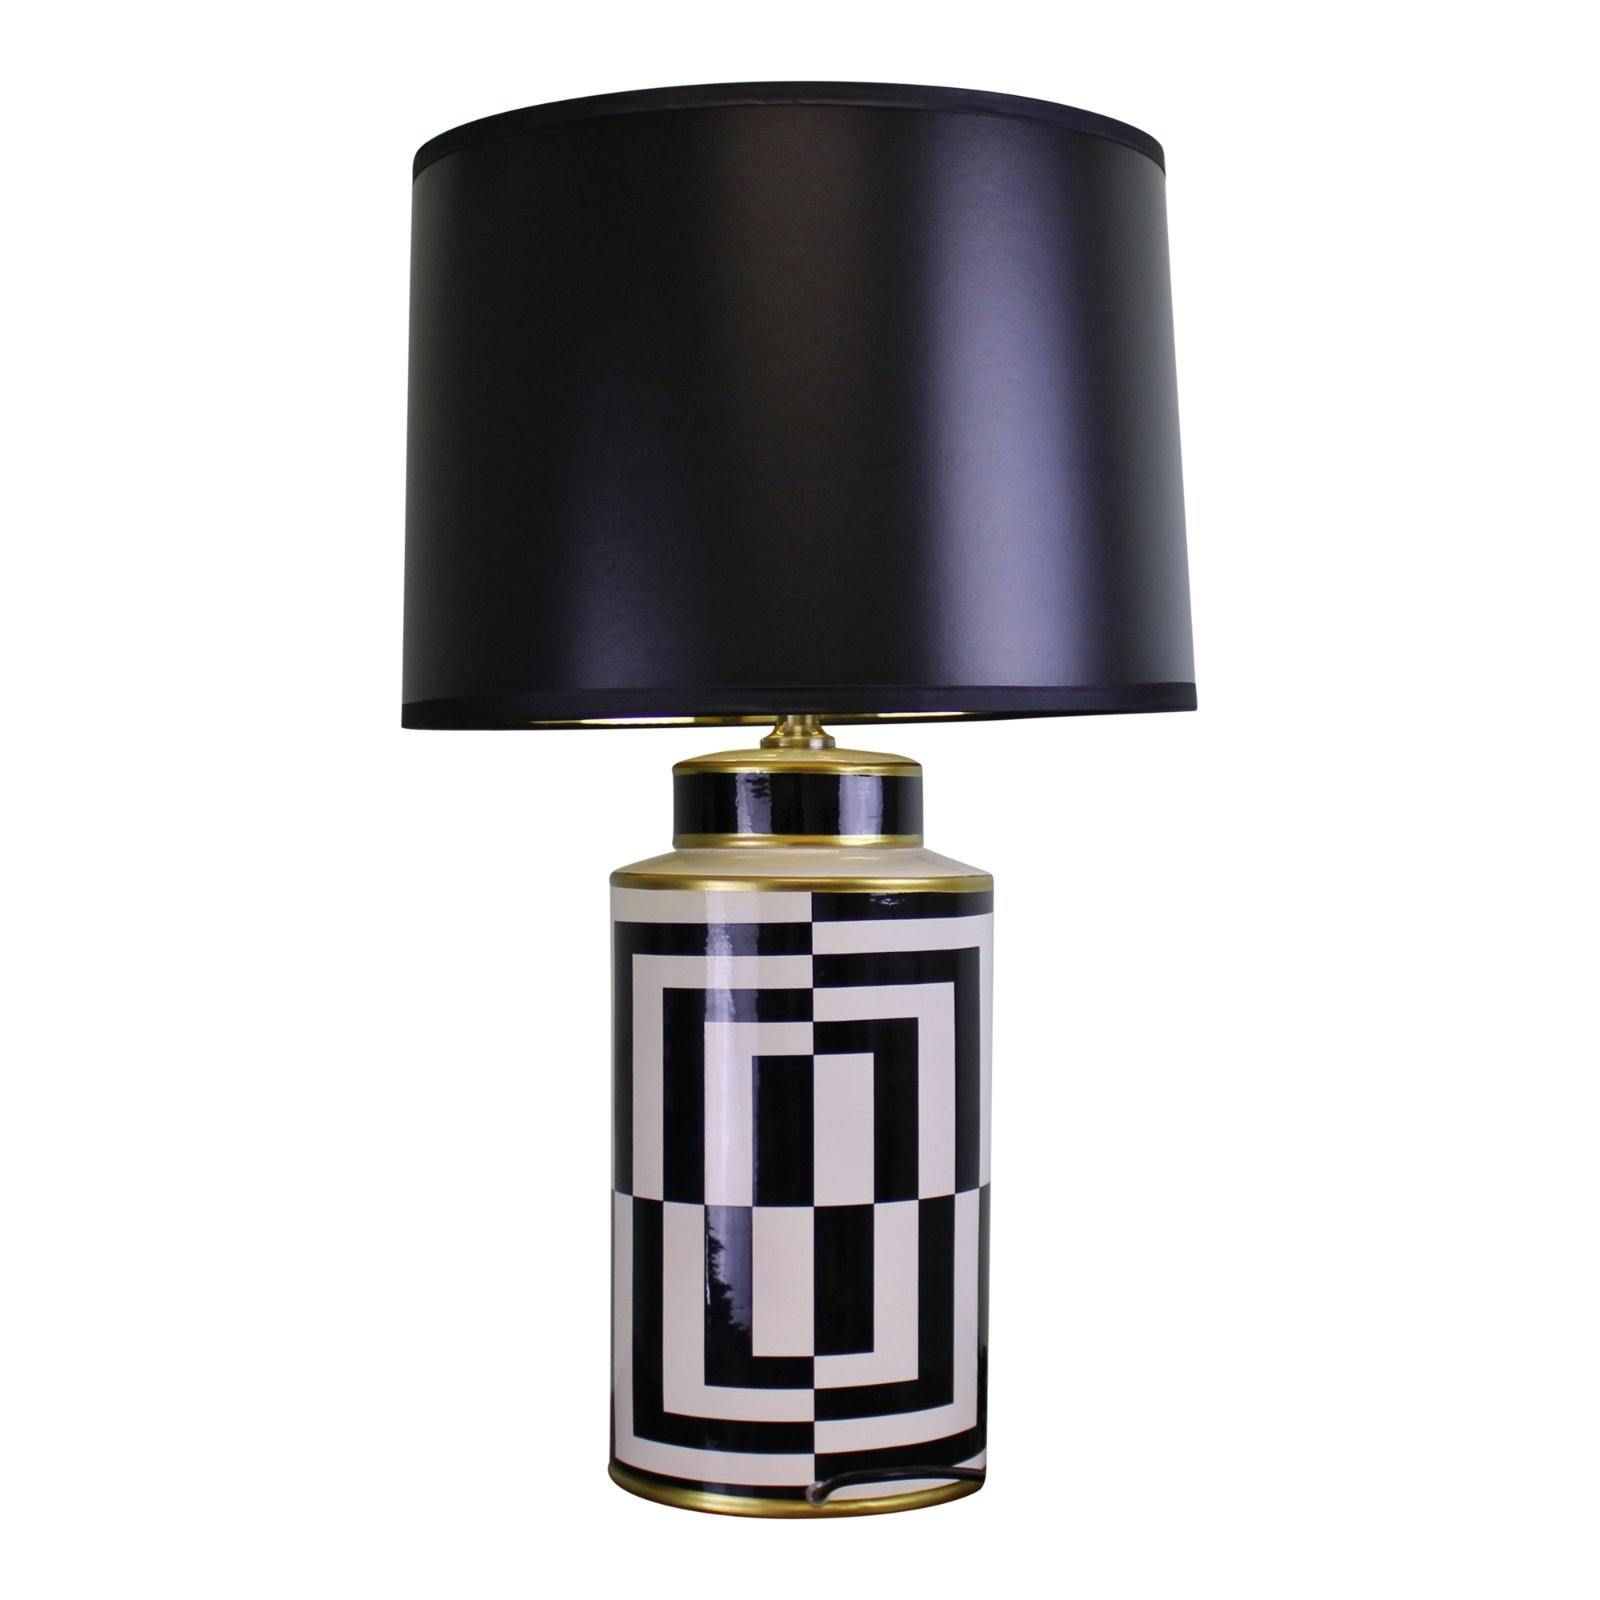 Photo of Black/White/Gold Ceramic Lamp, Geometric Design 66cm